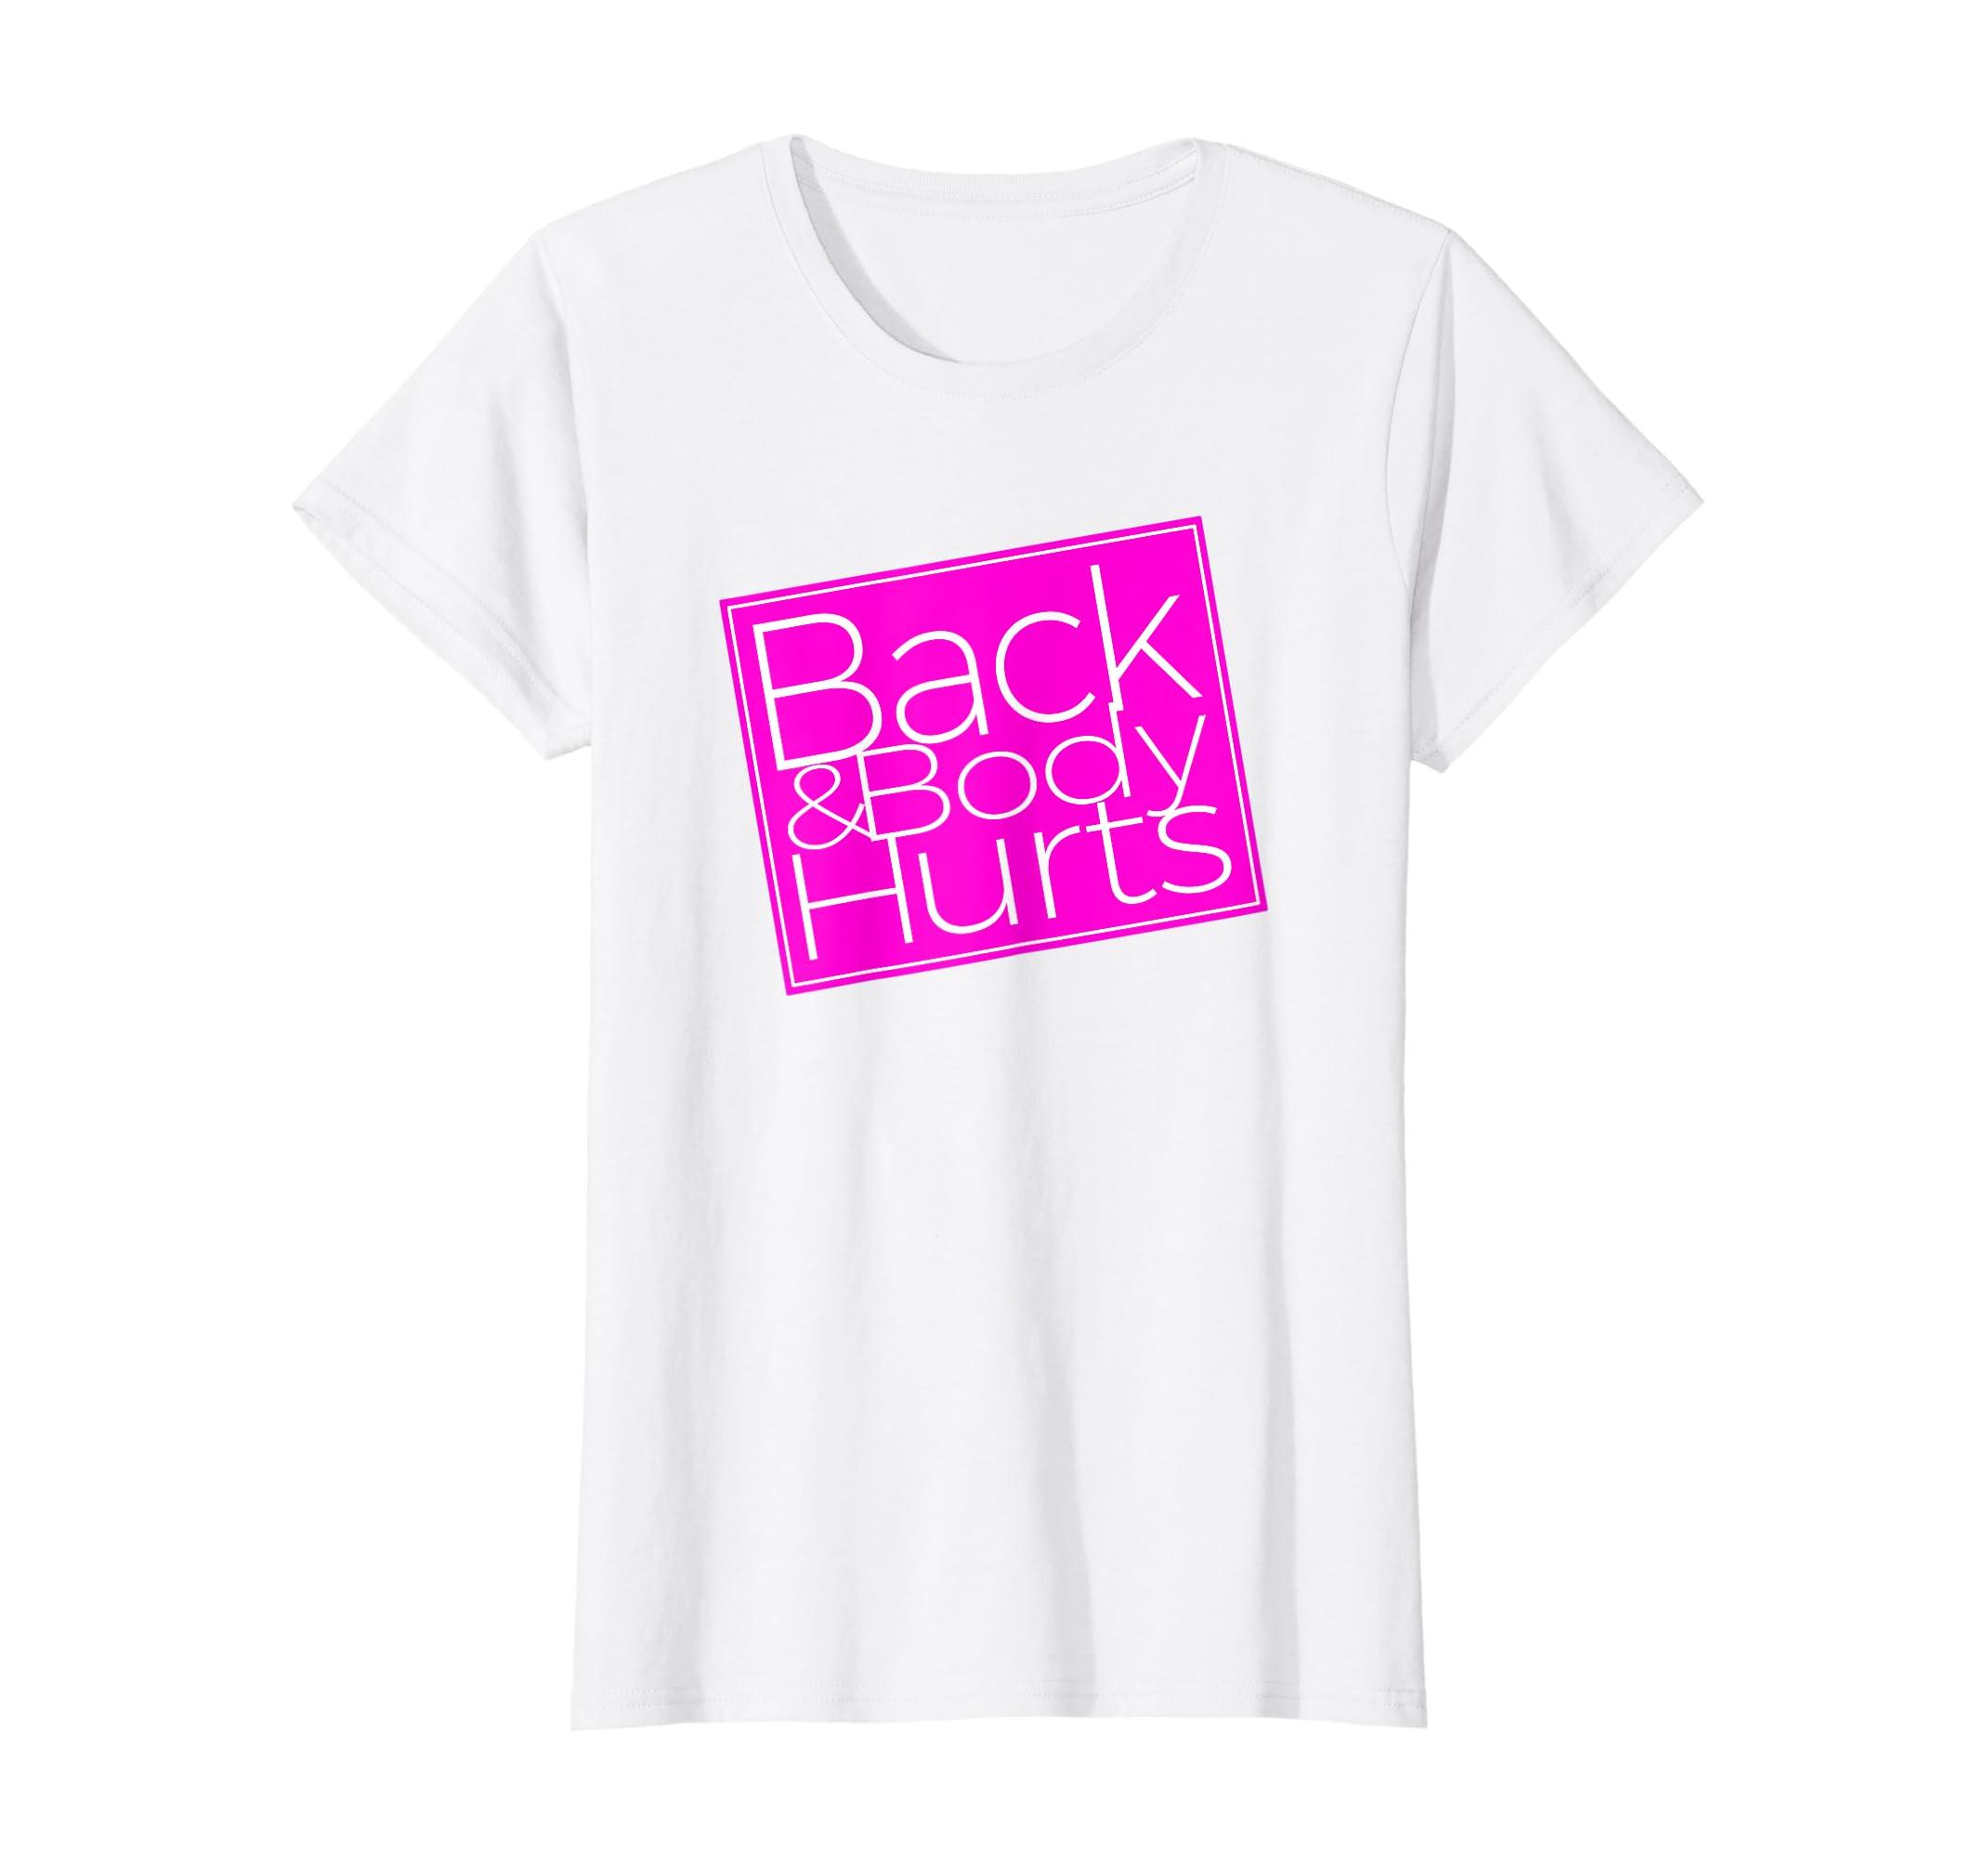 Back & Body Hurts T-Shirt-Loveshirt